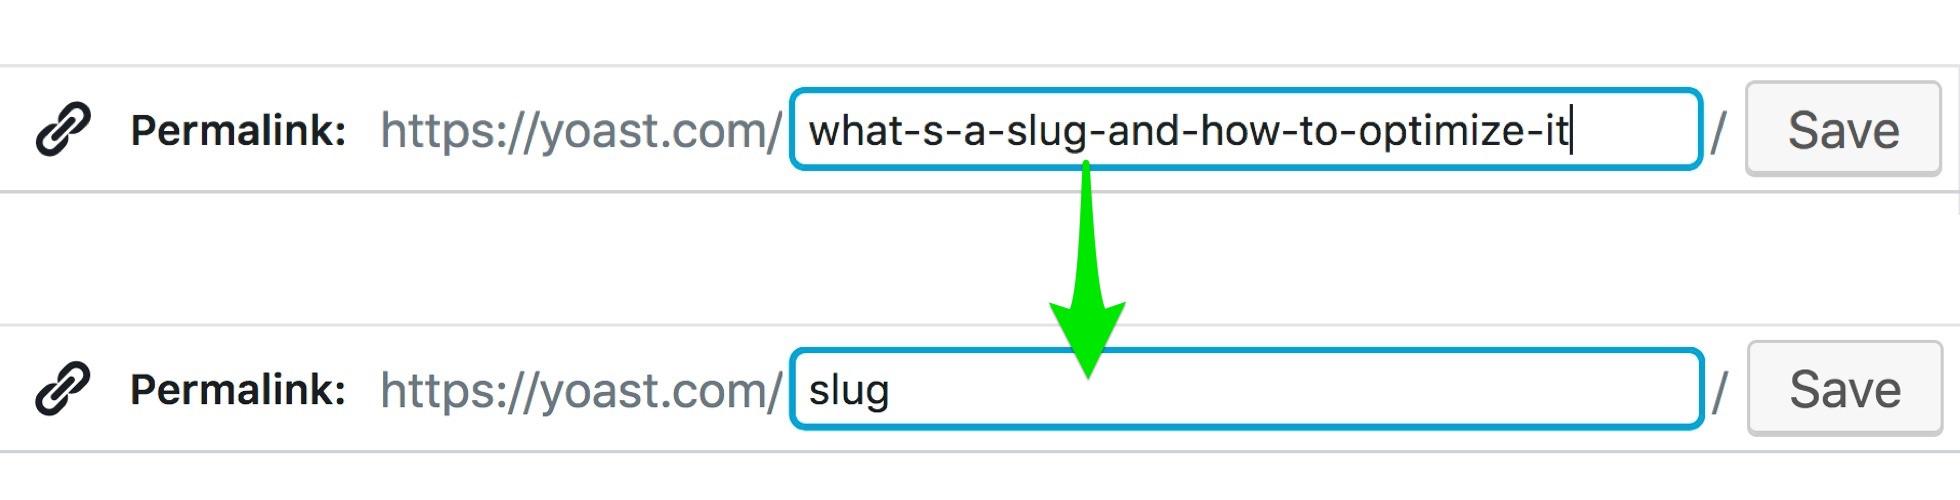 Reduced amount of words so slug is more focused